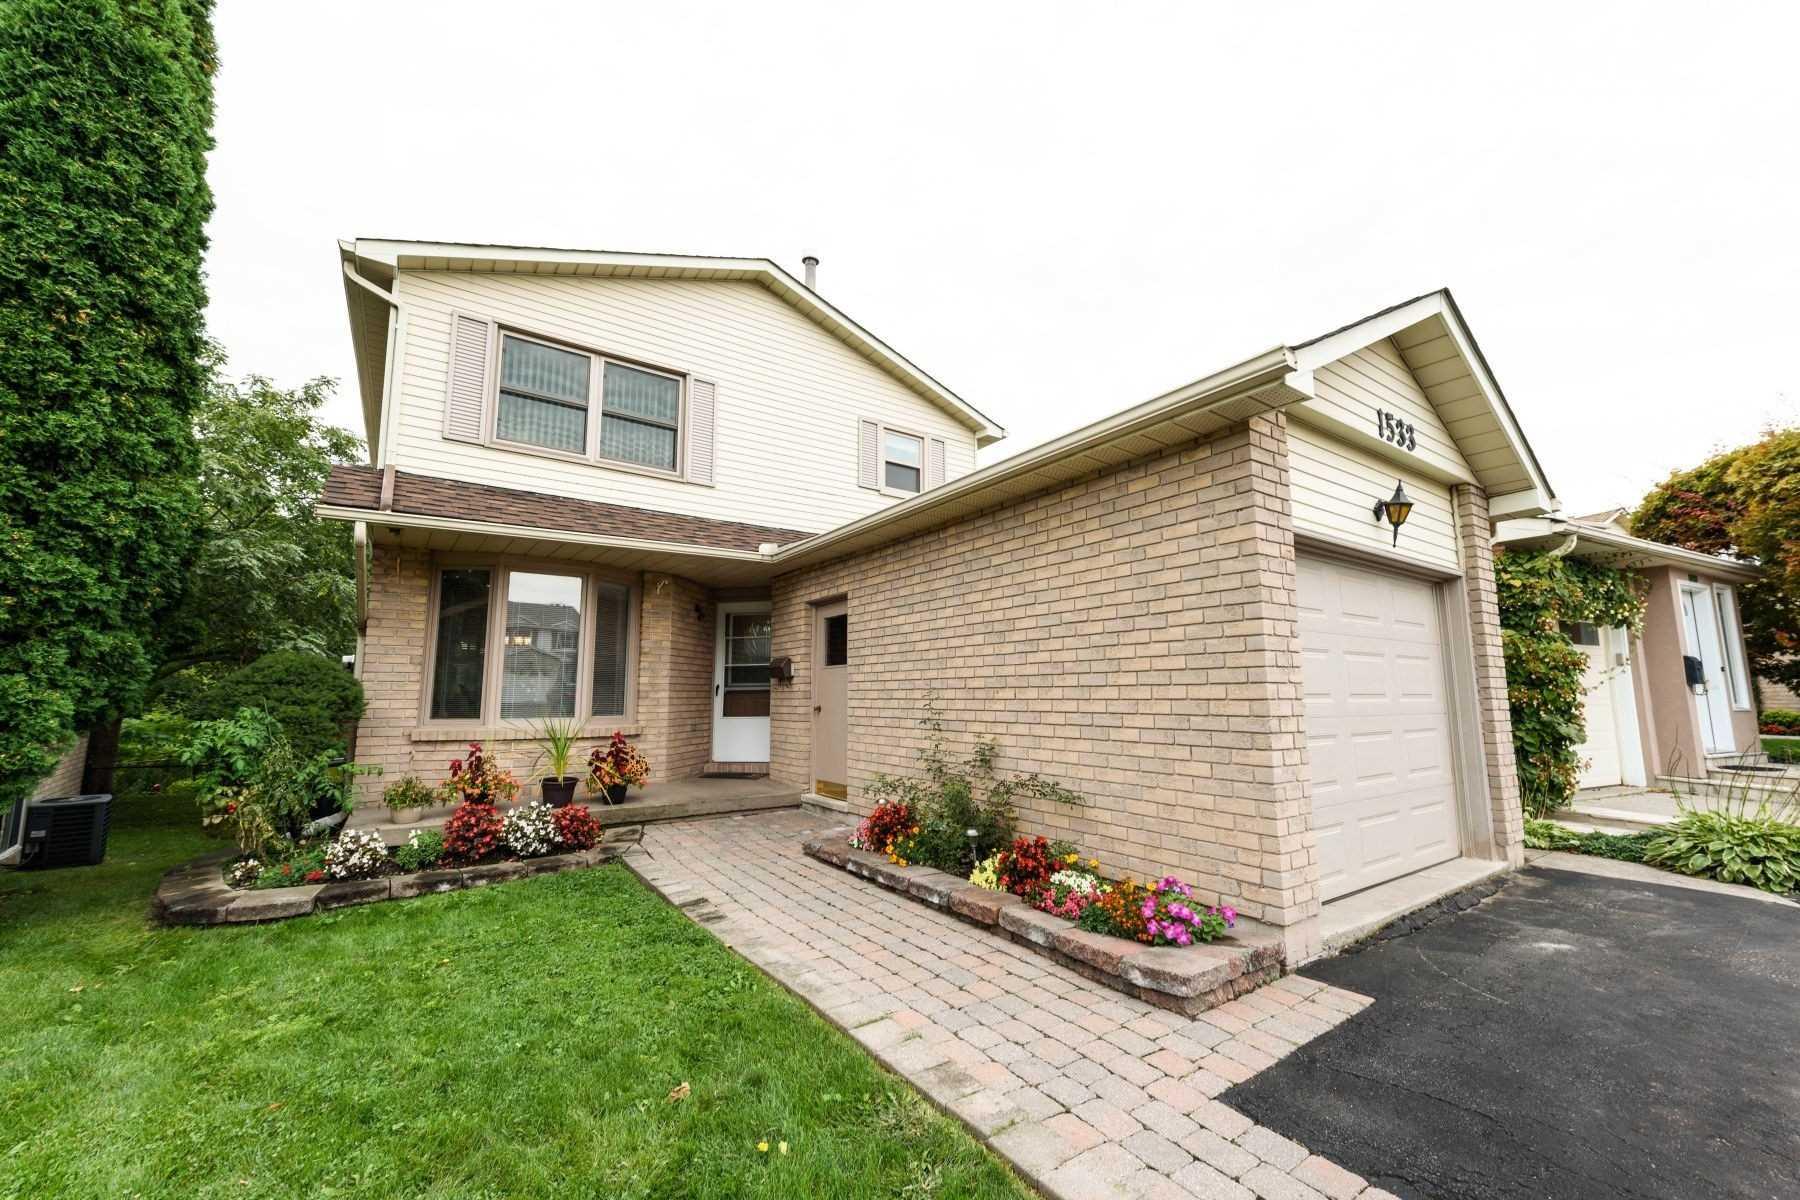 Detached house For Sale In Burlington - 1533 Riley Ave, Burlington, Ontario, Canada L7M3E8 , 3 Bedrooms Bedrooms, ,3 BathroomsBathrooms,Detached,For Sale,Riley